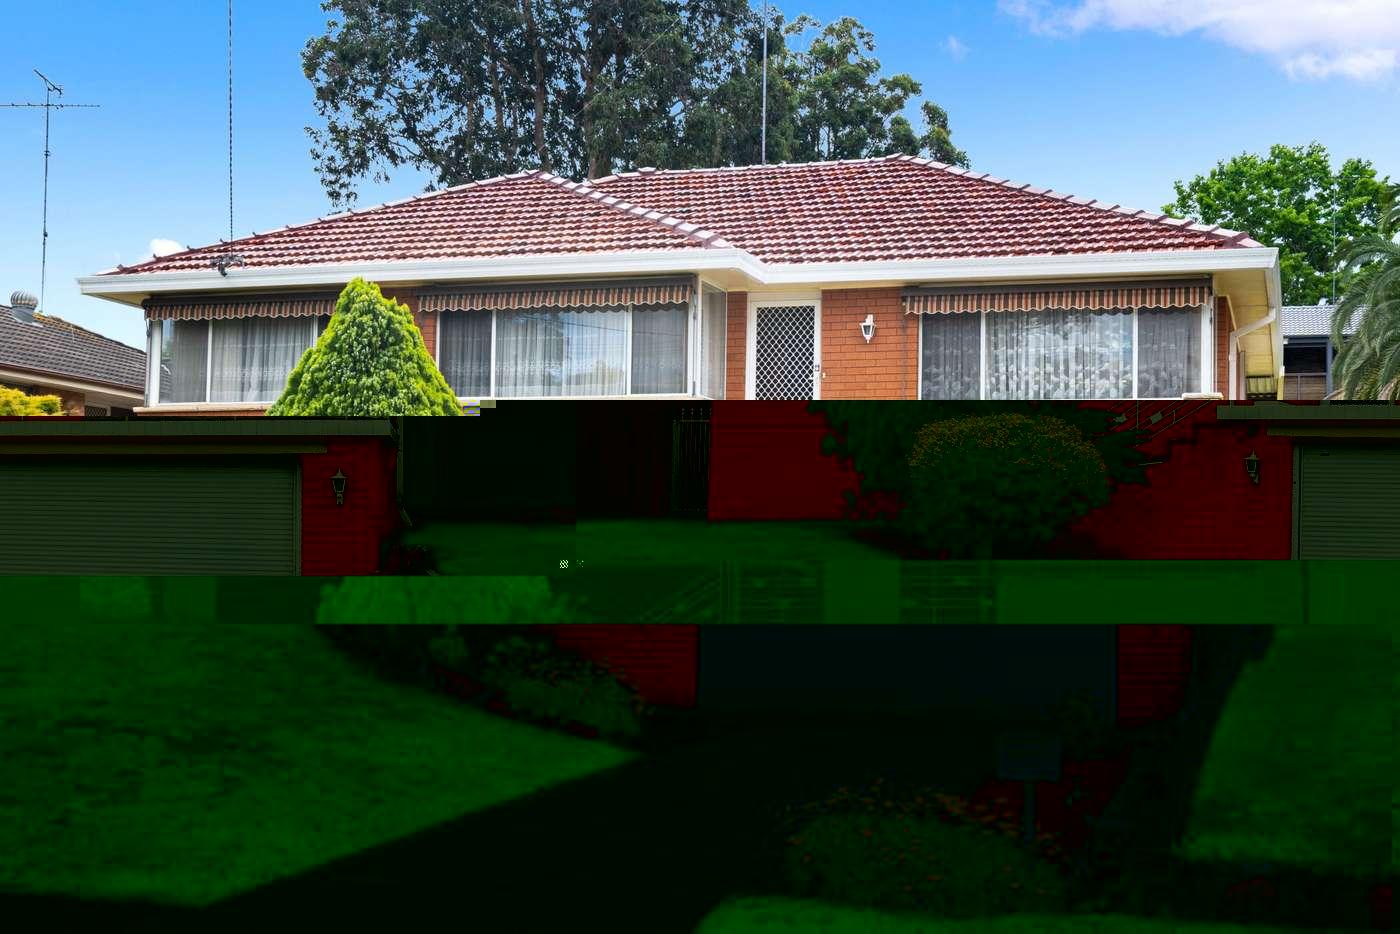 Main view of Homely house listing, 142 Baulkham Hills Road, Baulkham Hills NSW 2153